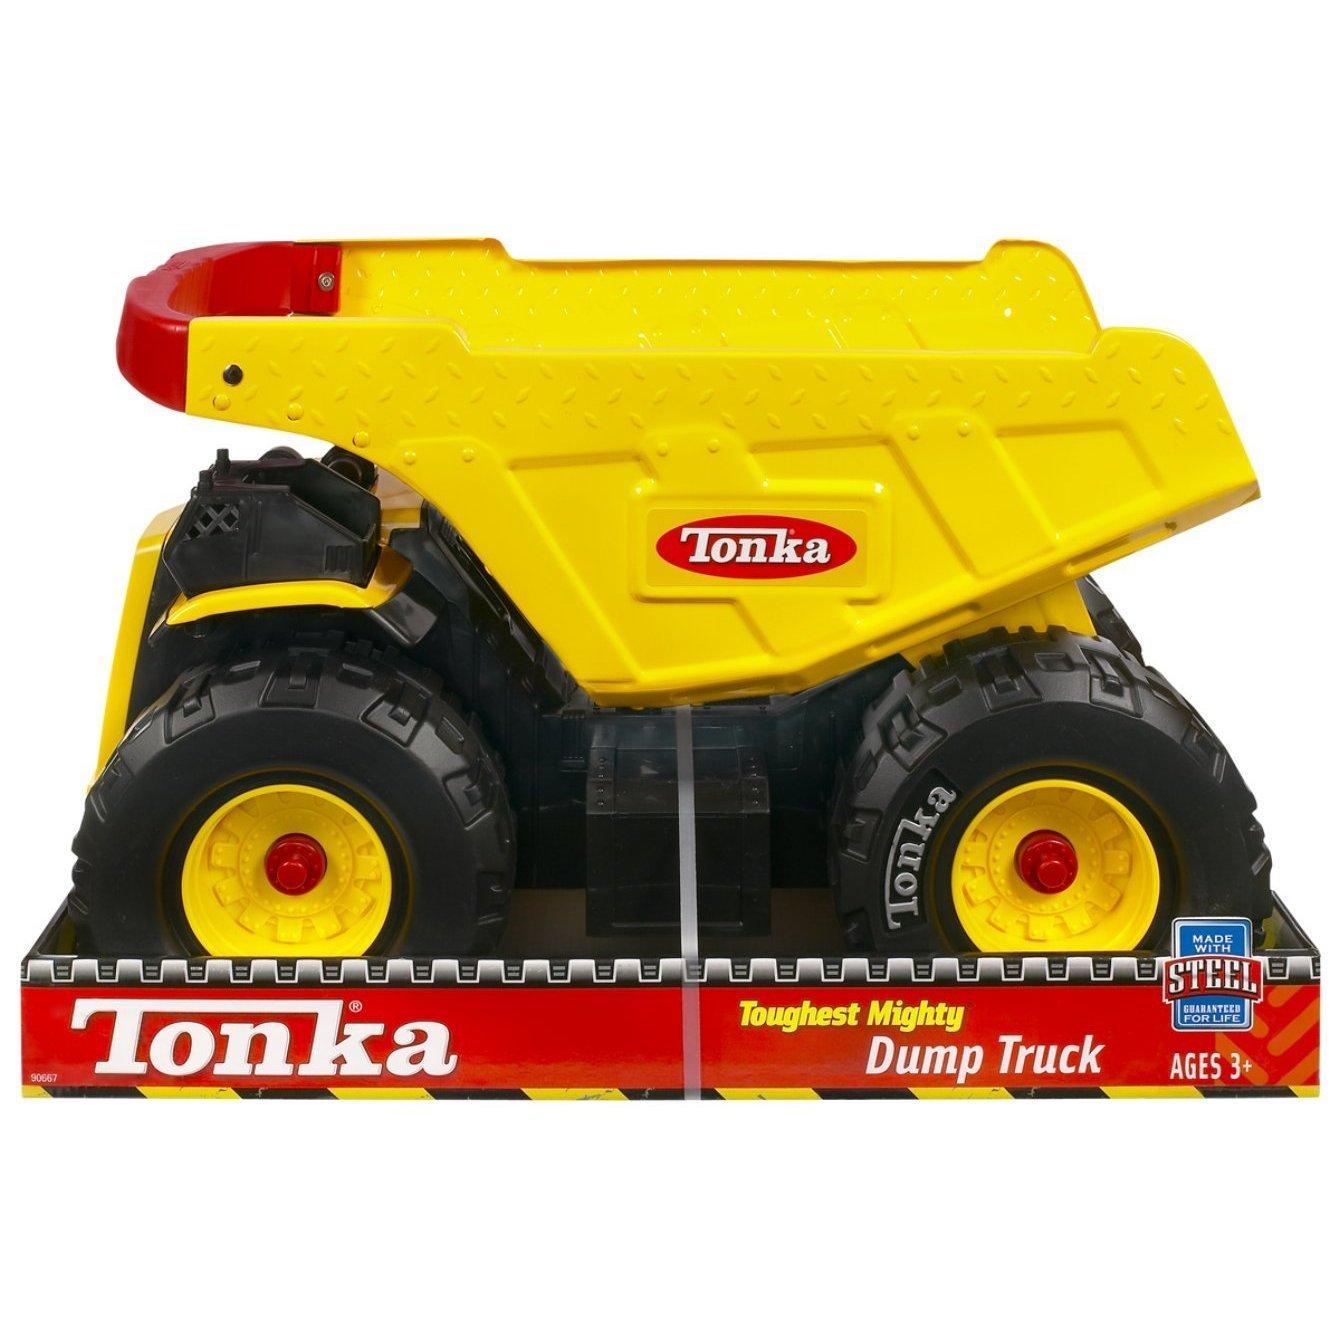 Tonka Toughest Mighty Truck (Handle Color May Vary) by Hasbro 90667